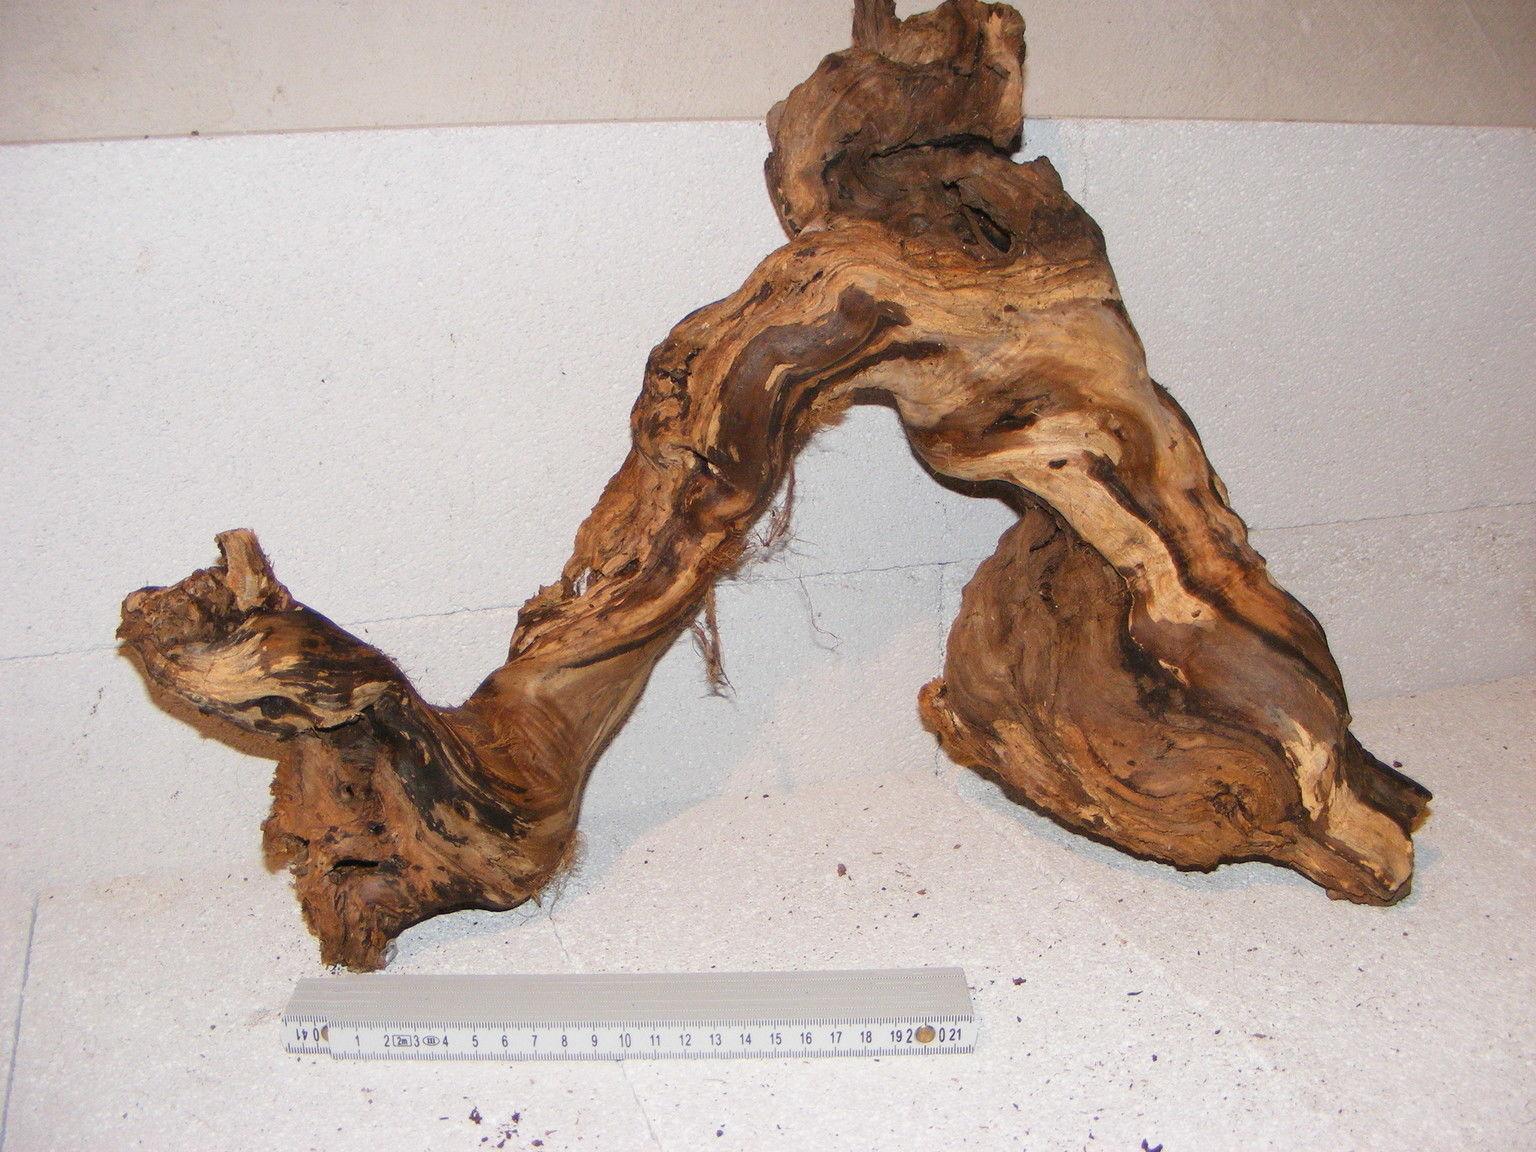 Wurzel Deko wurzel ast 51×38 cm dekoholz dekoration rebholz rebenholz echt holz